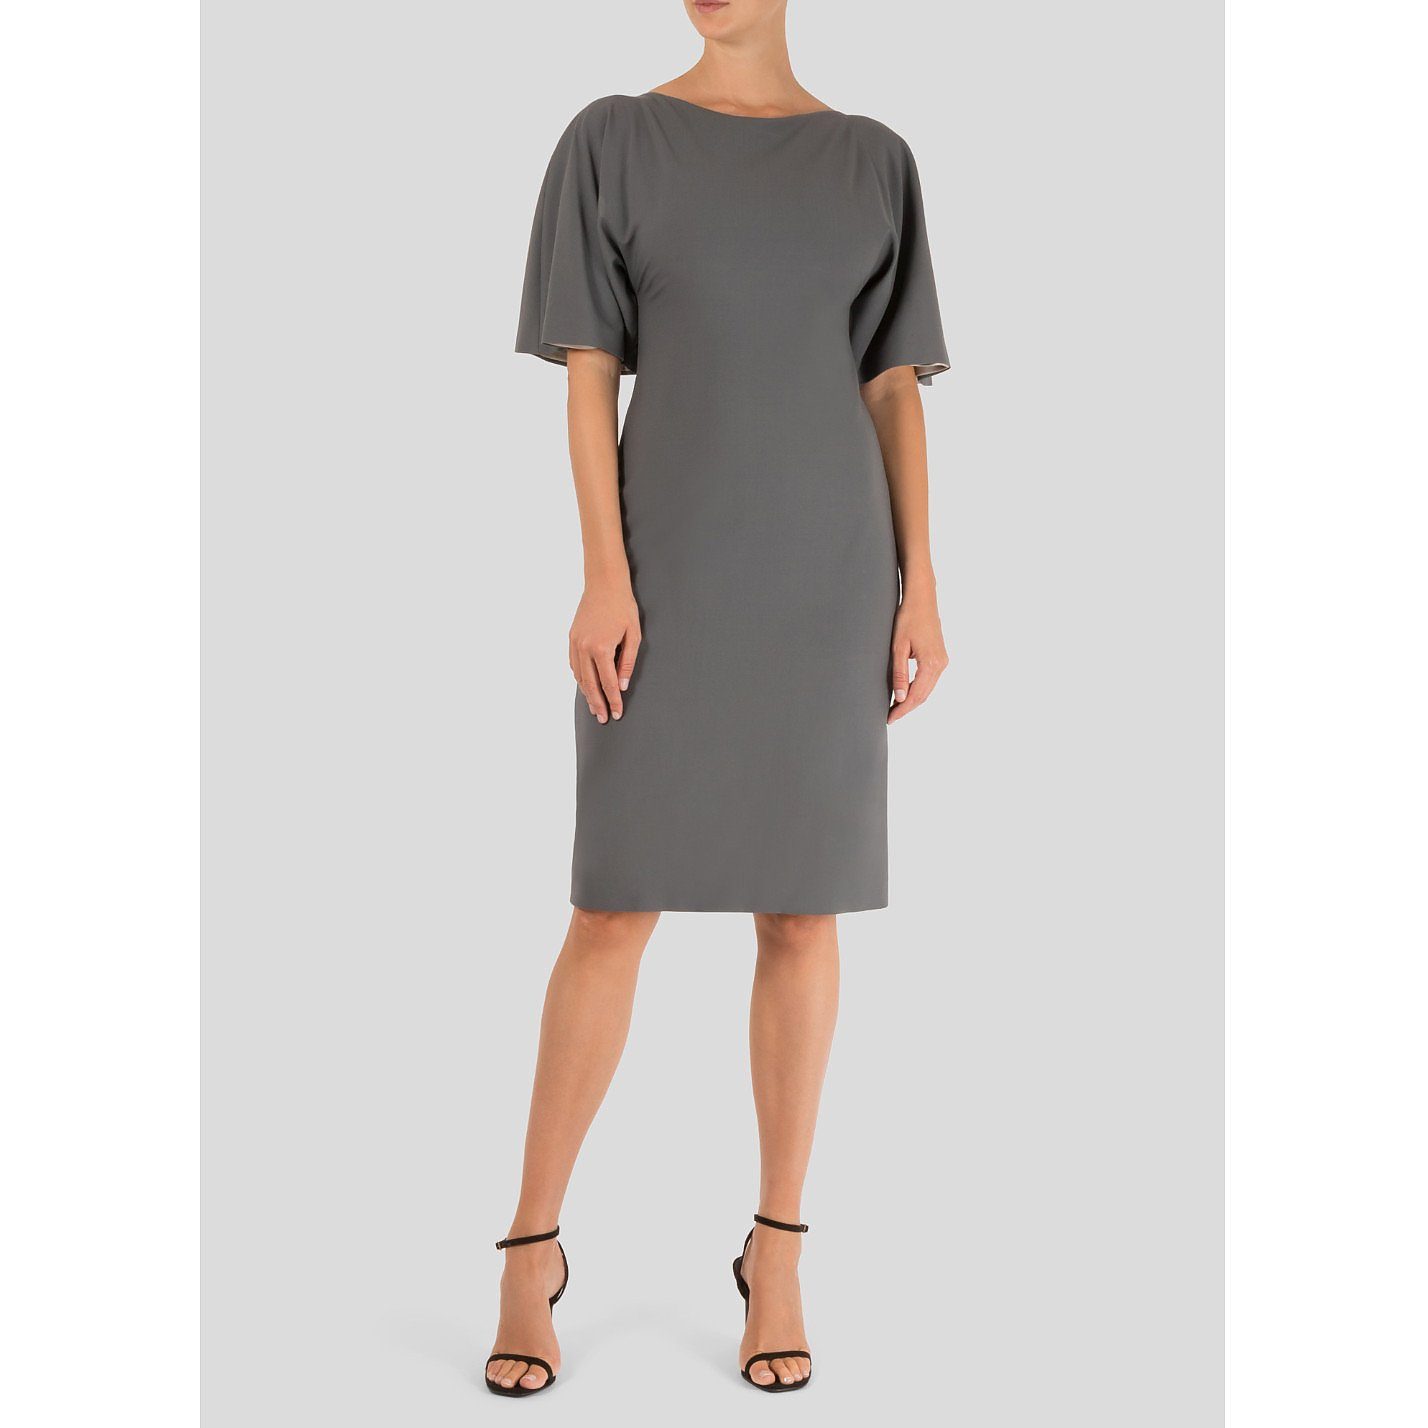 Britt Lintner Short Sleeved Wool Dress